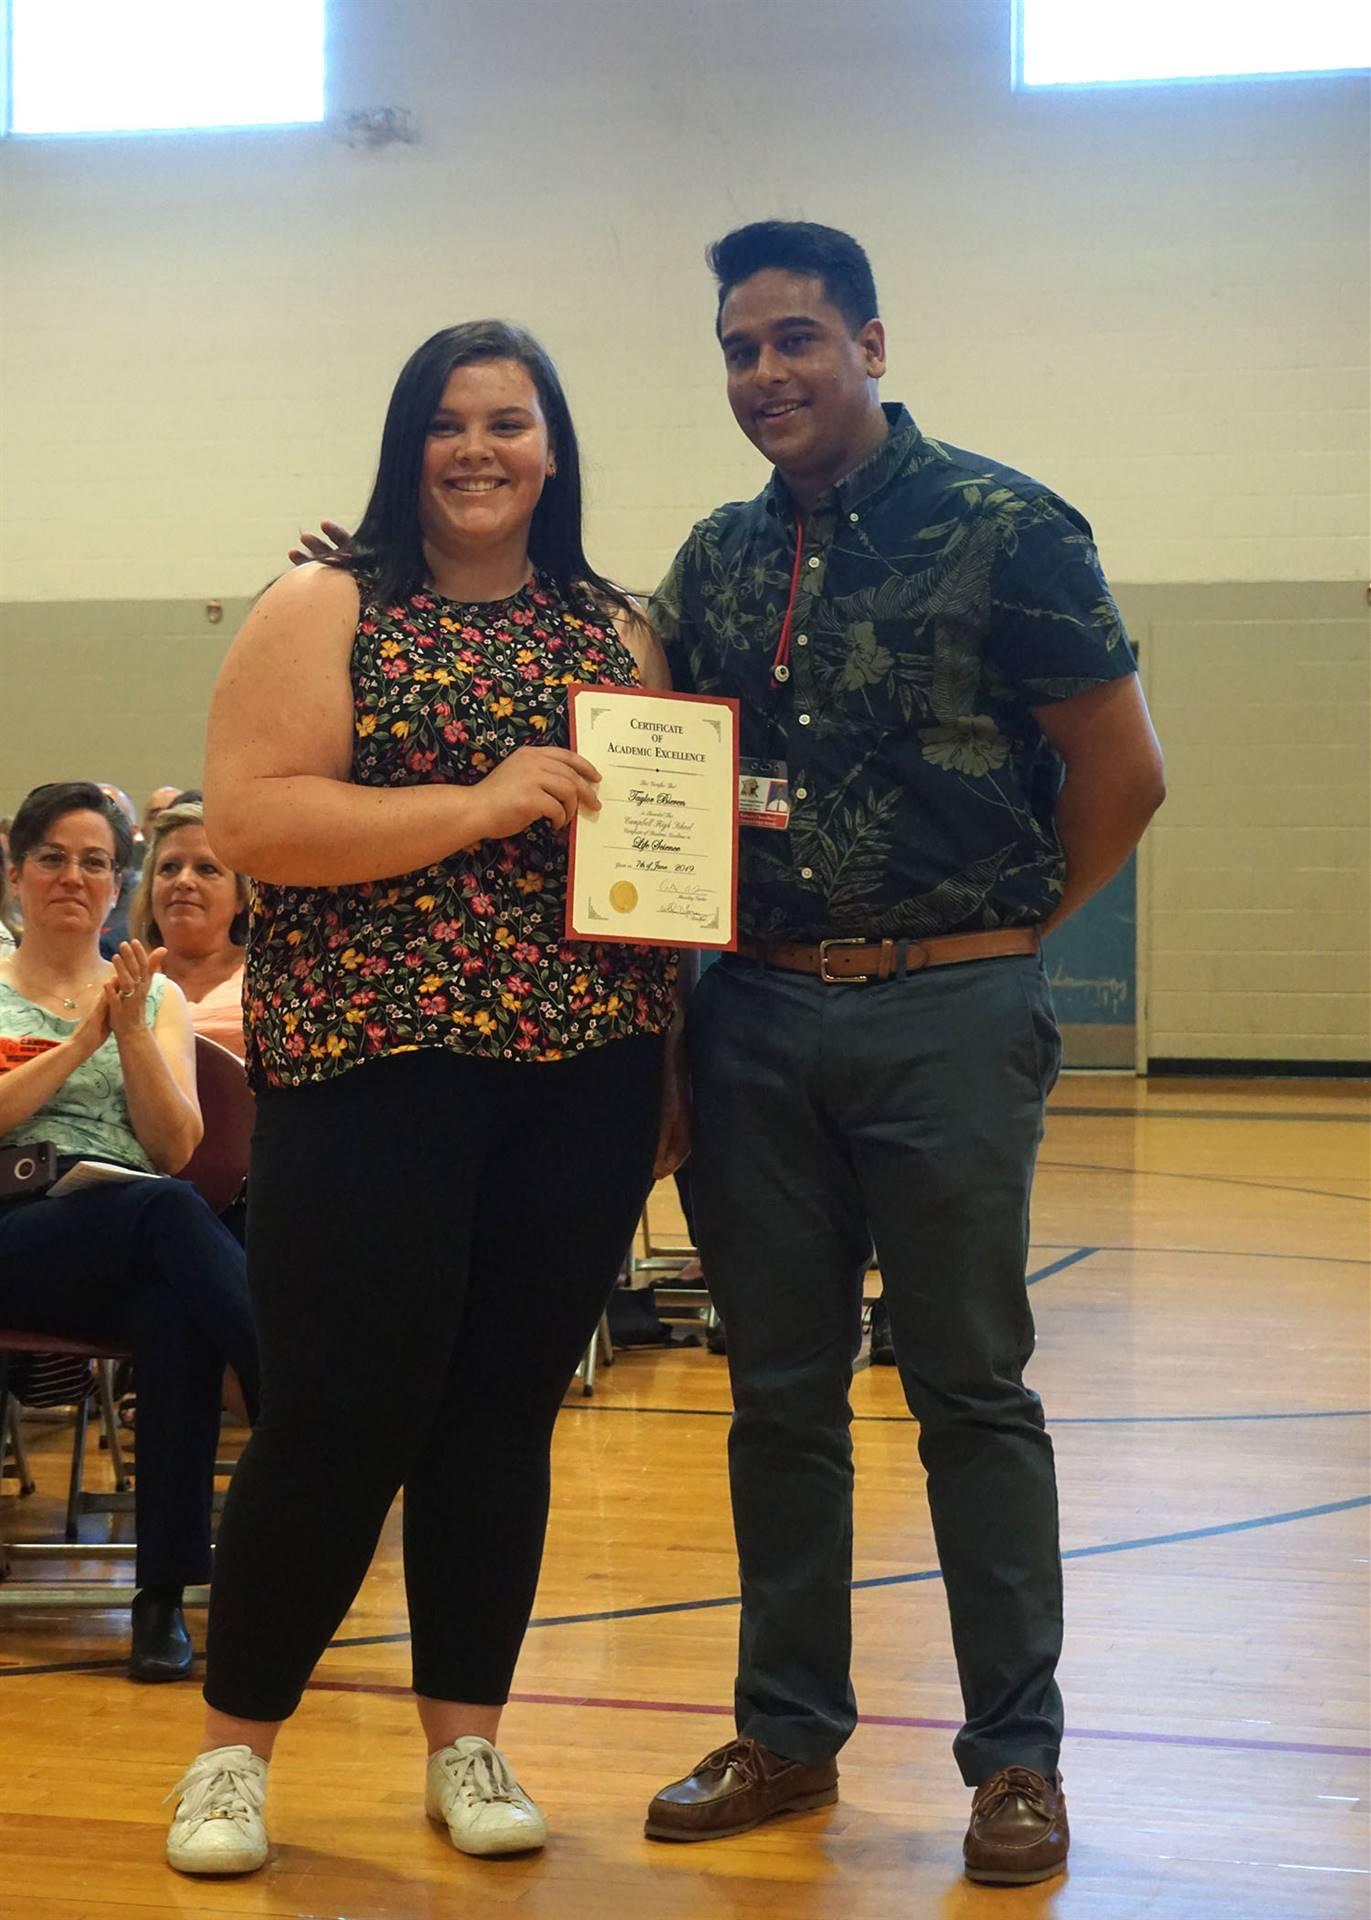 Life Science Department Award